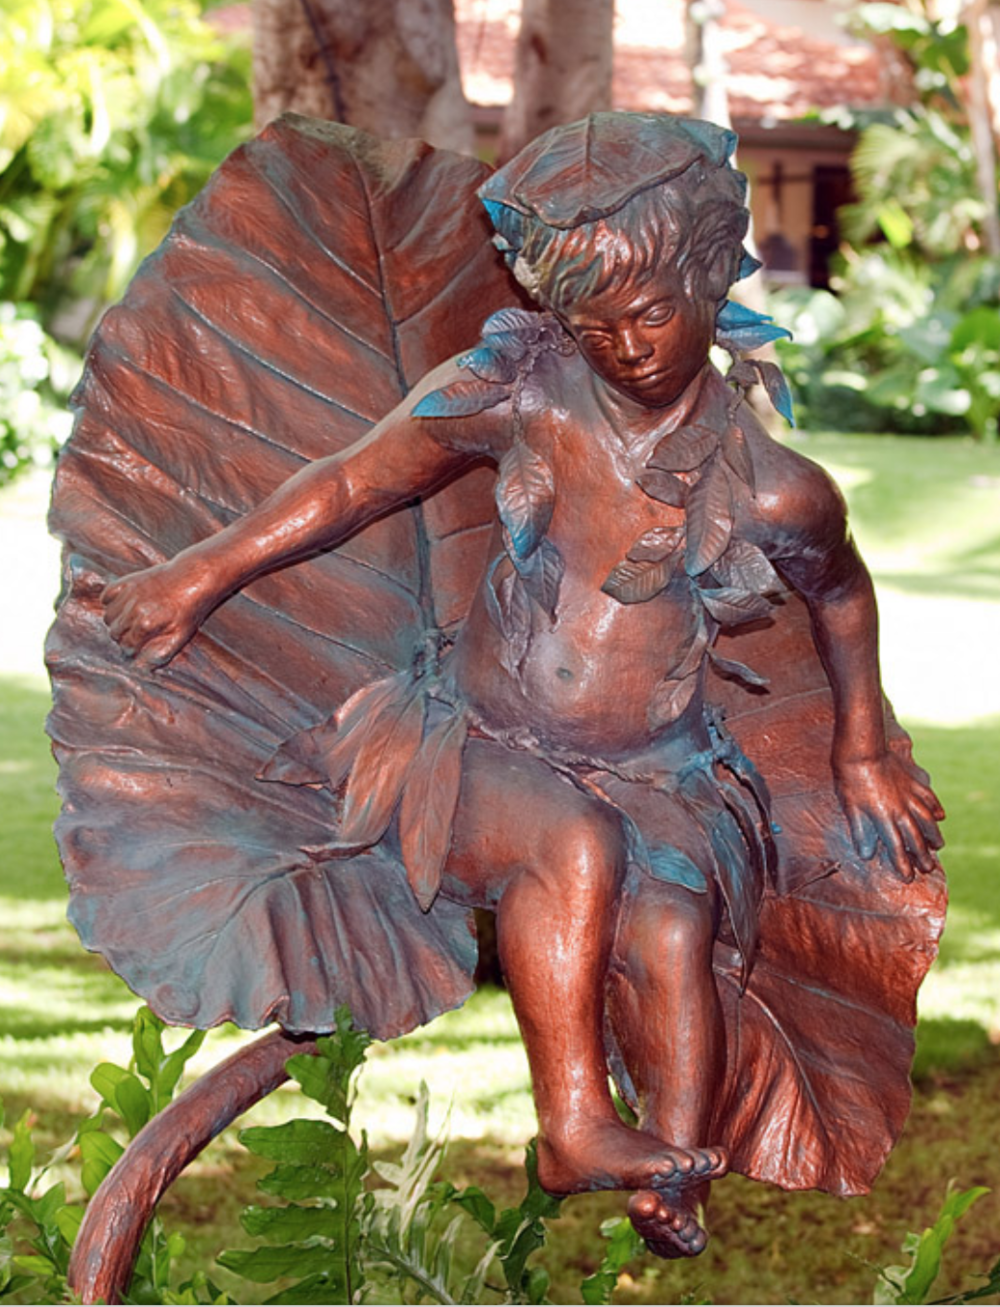 The Menehune, Hawai'ian guardian spirits of place